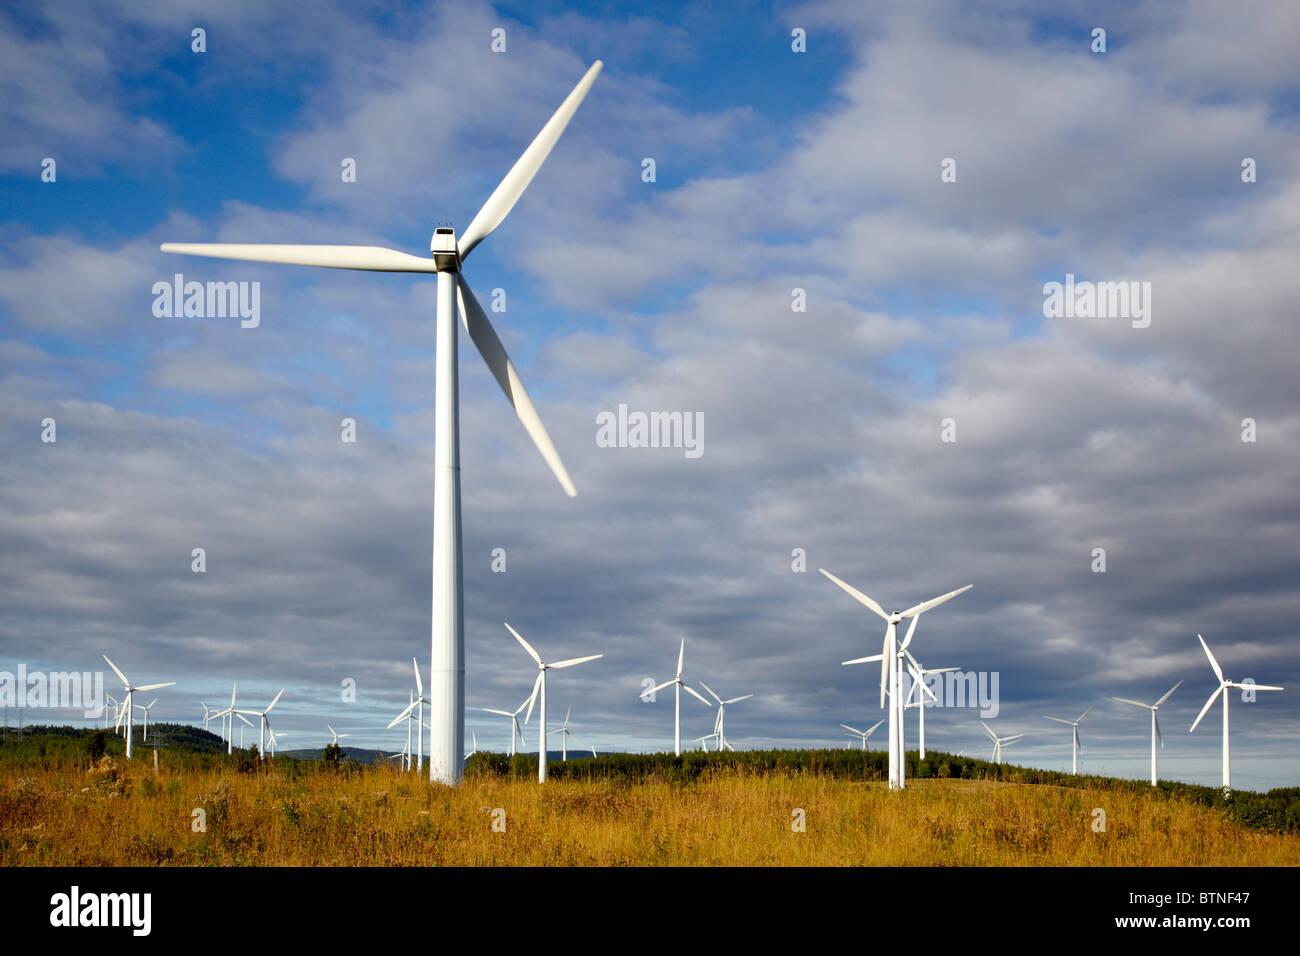 Eole, Cap-Chat, wind turbines, Gaspesie, Quebec, Canada - Stock Image